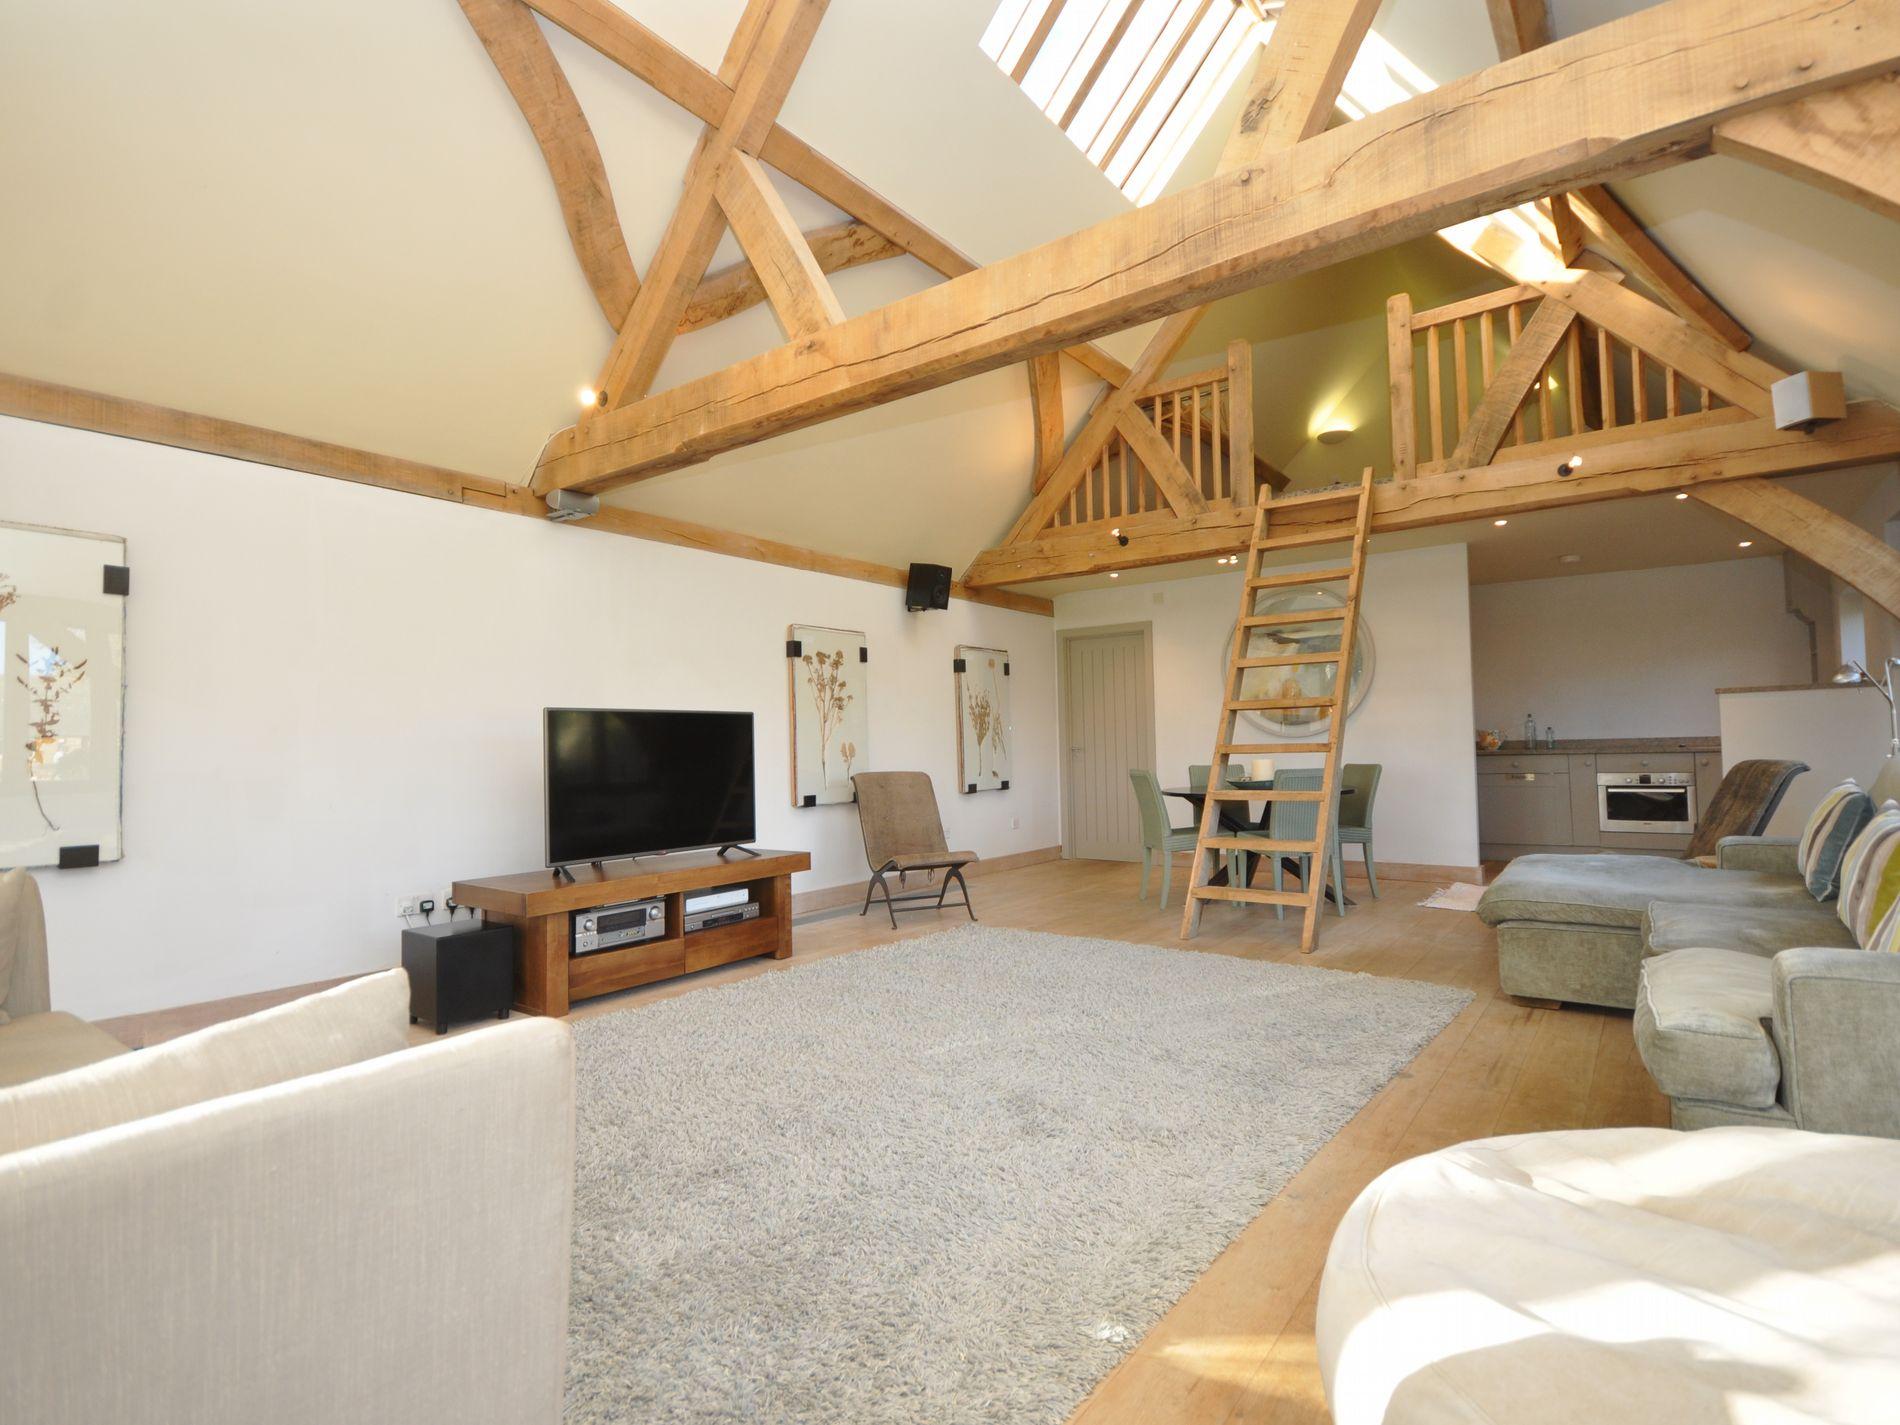 Additional living space in the oak framed barn